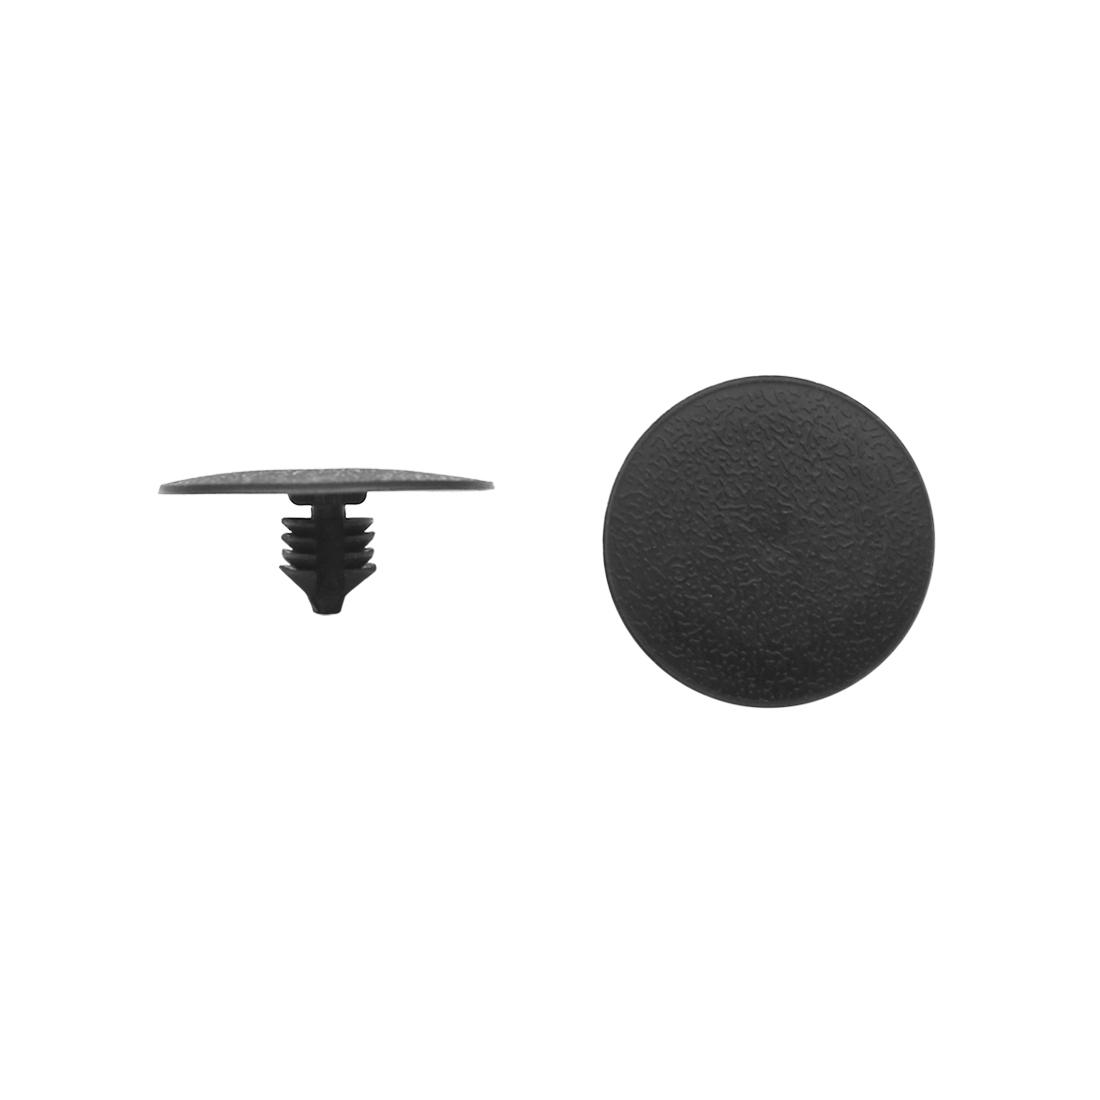 20pcs 8mm Hole Car Plastic Clips Rivet Fit Boot Trim Panel Pin Fender Black